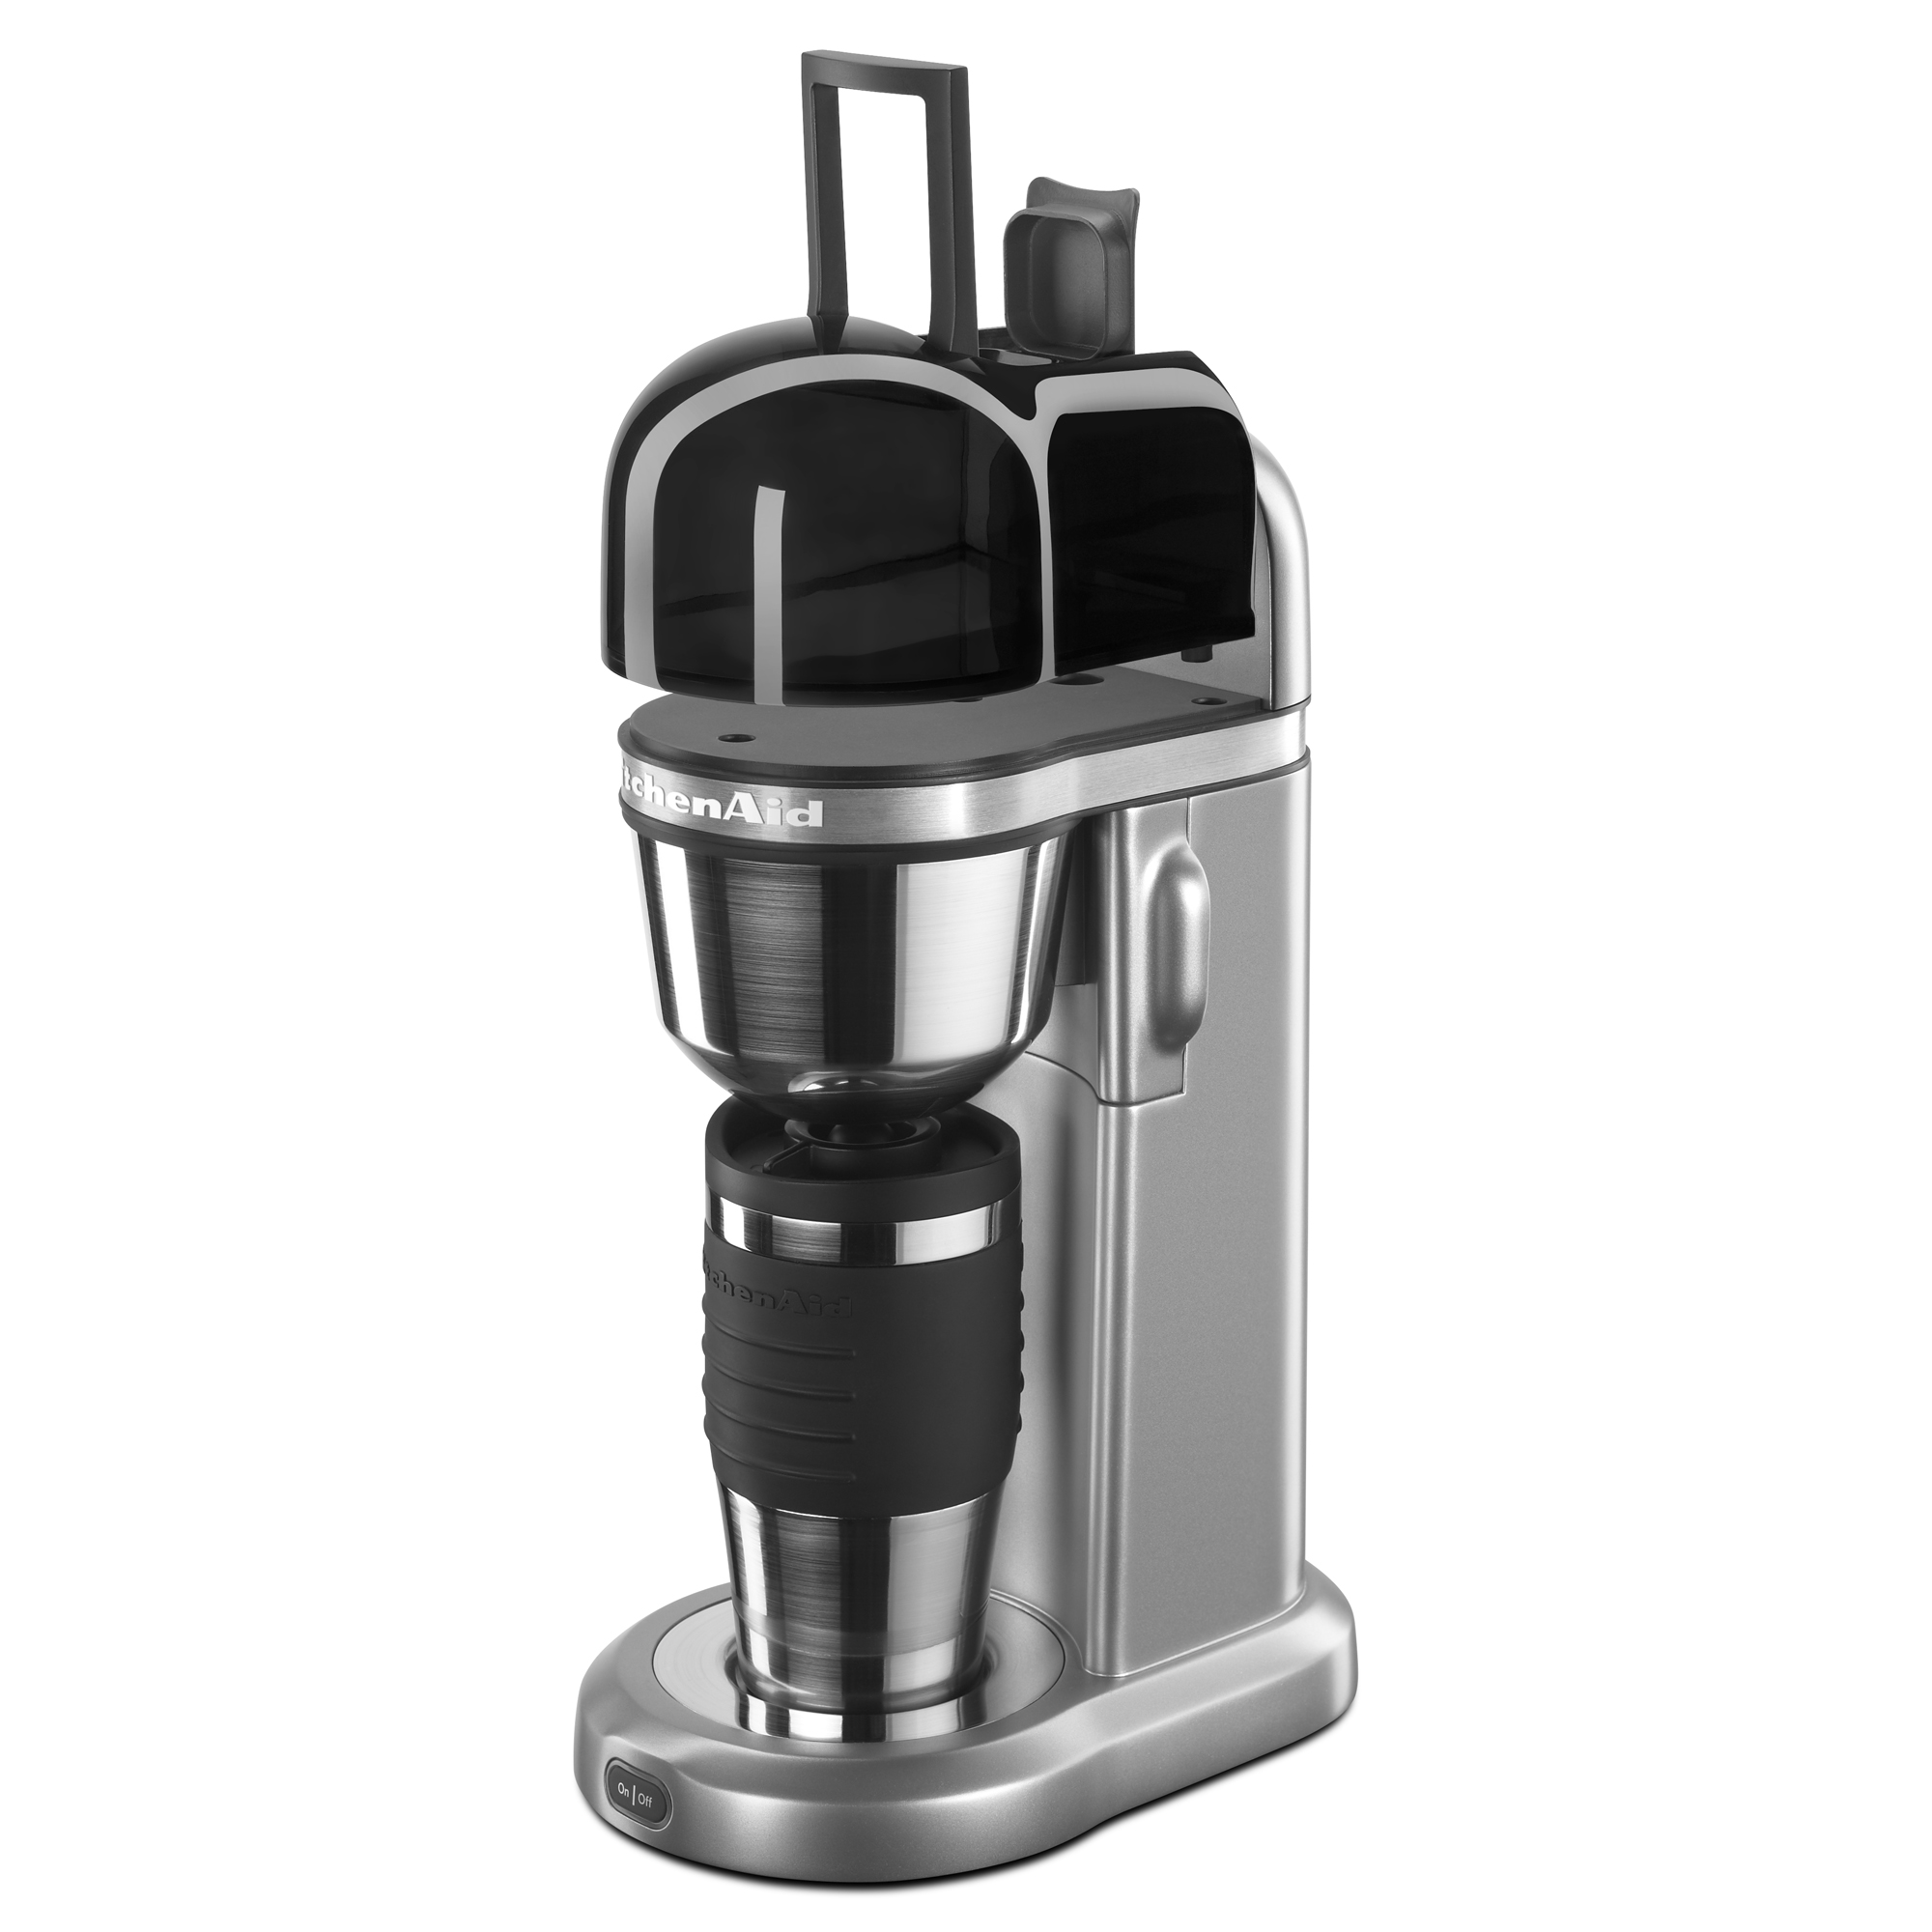 KitchenAid-Refurbished-Personal-Coffee-Maker-with-18-oz-Thermal-Mug-RKCM0402 thumbnail 5